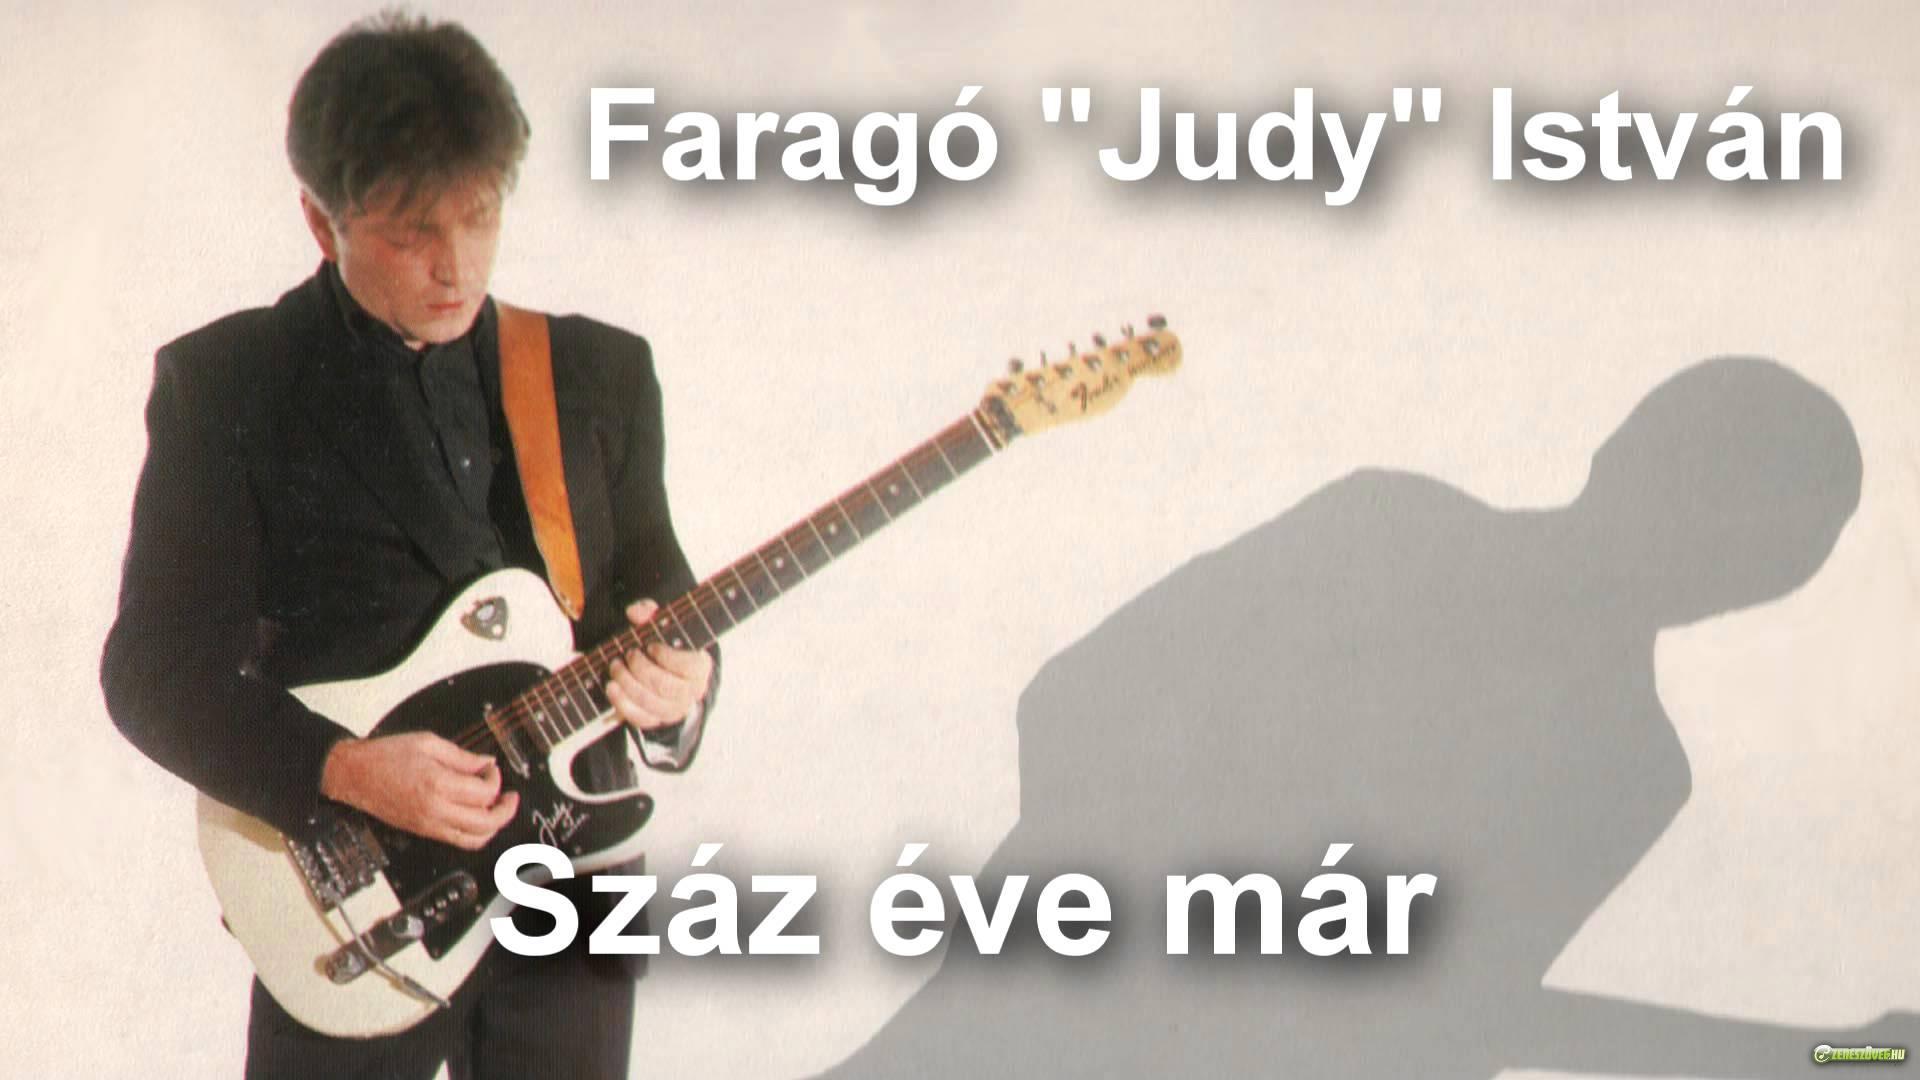 Faragó Judy István